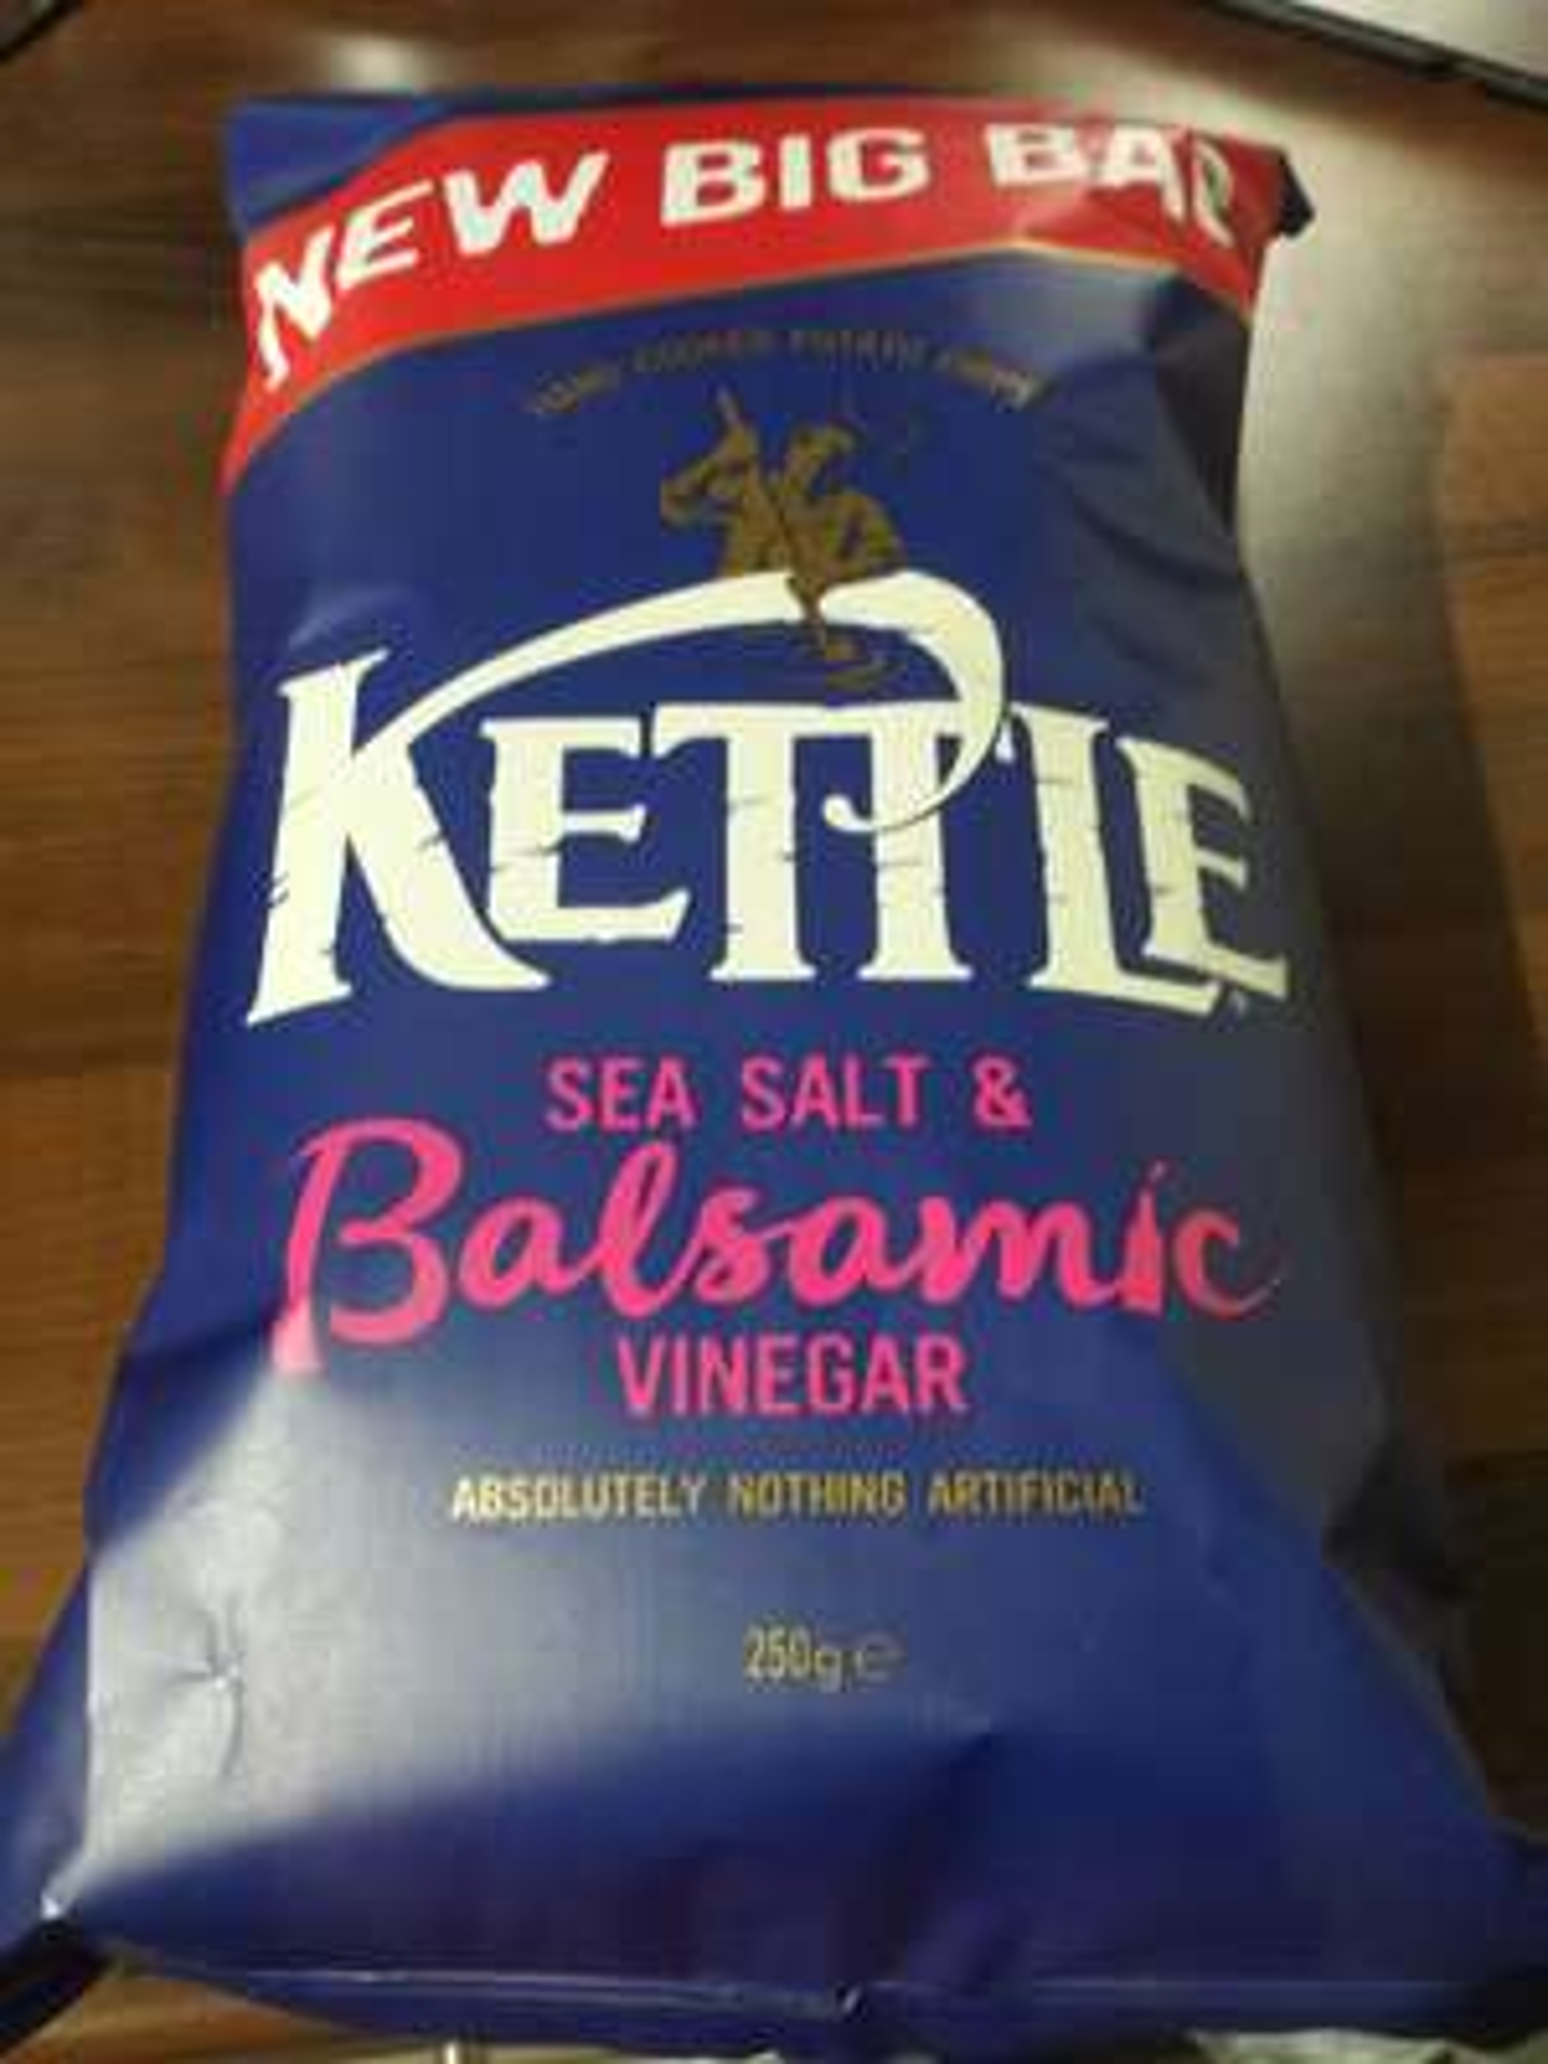 Kettle crisps 250g sharing bags £1.50 @ Spar